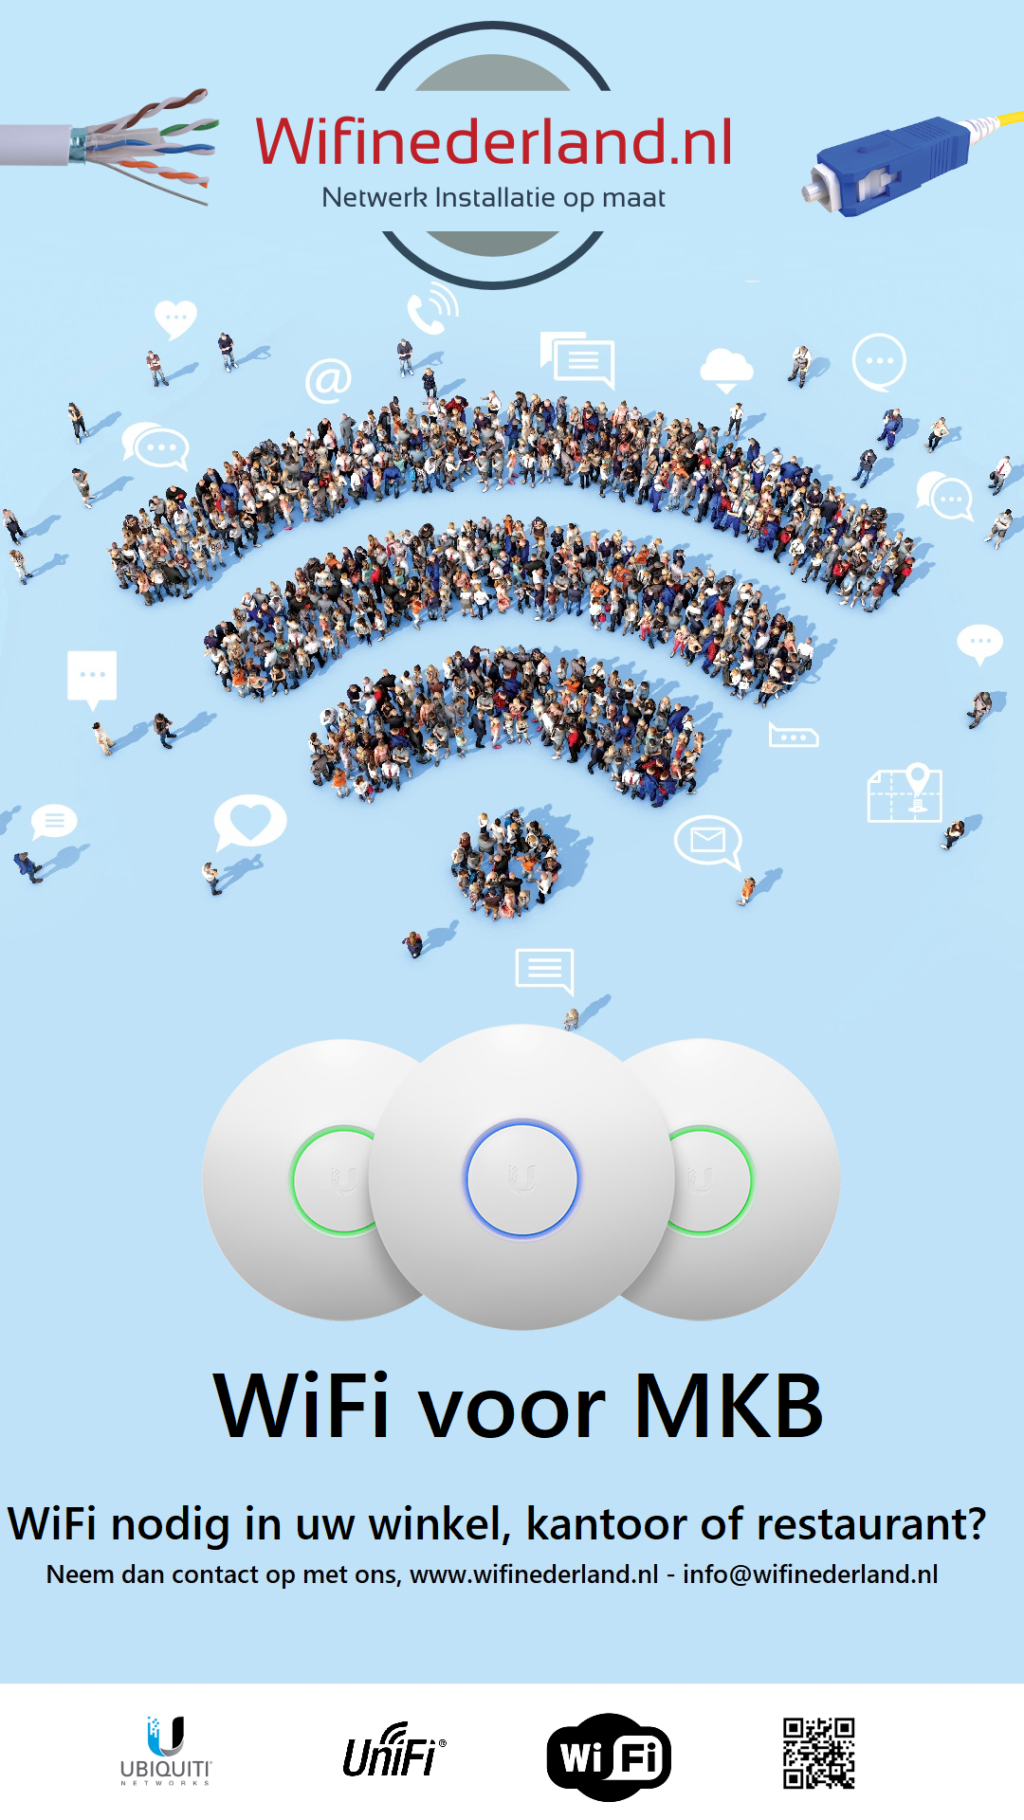 WiFi MKB